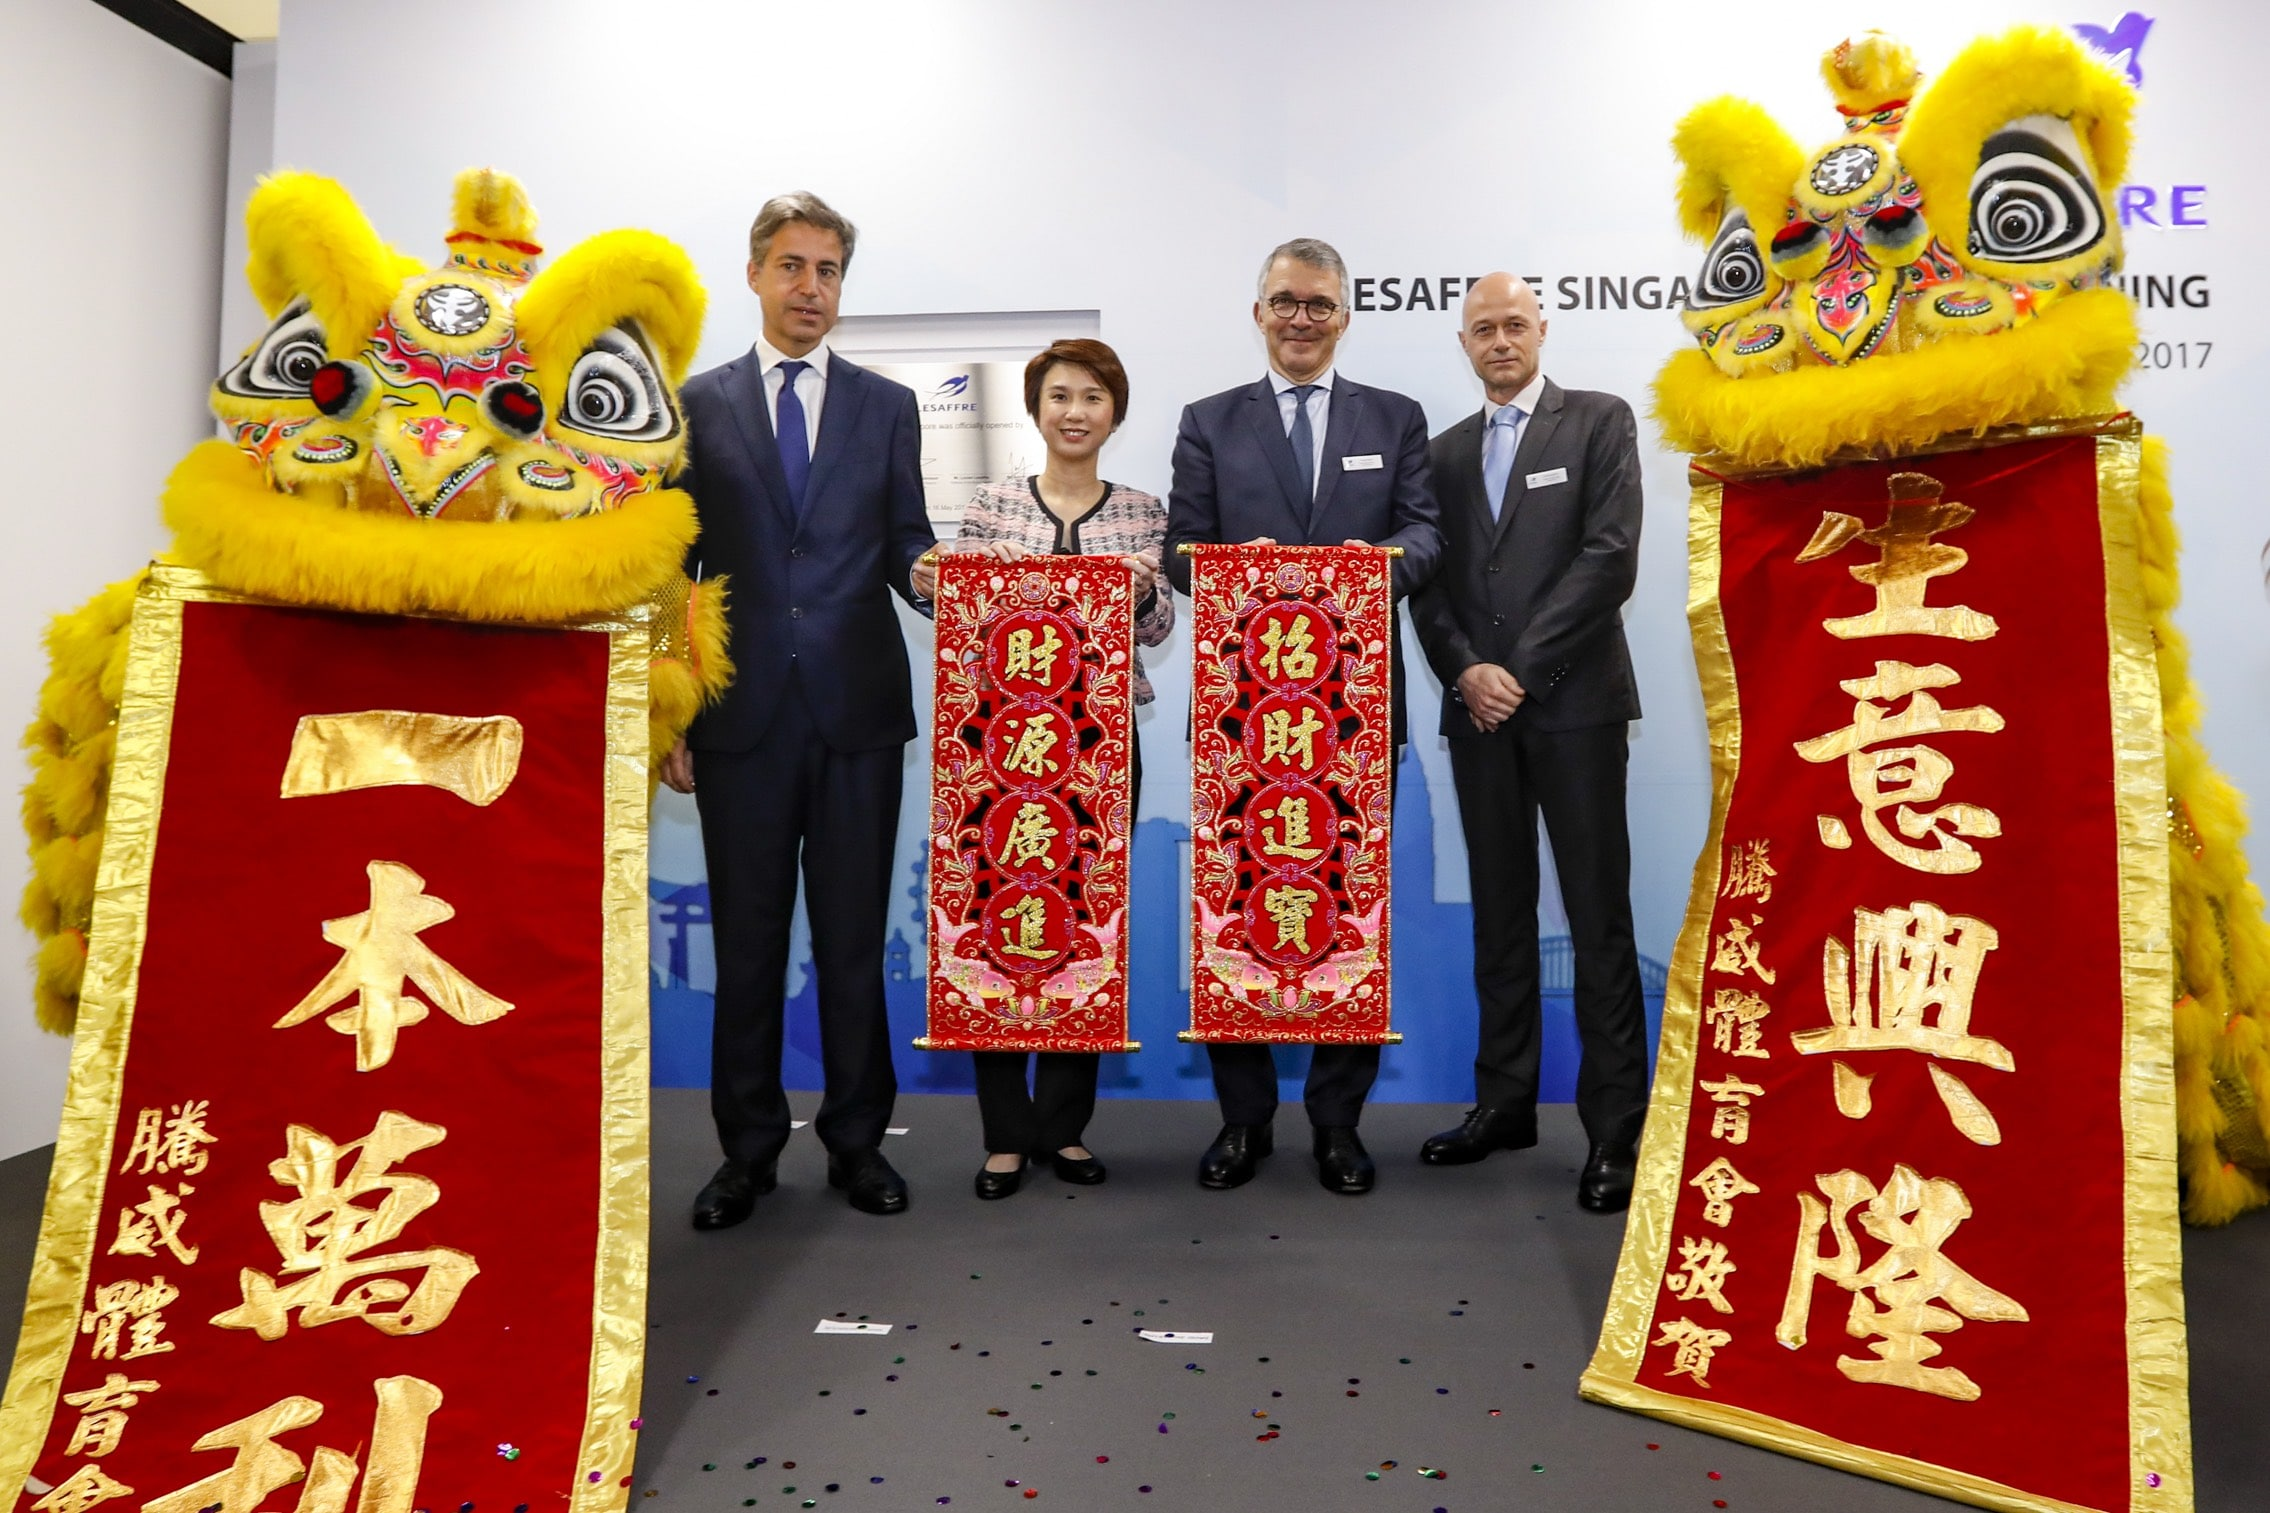 Lesaffre opens new asia regional hub in Singapore